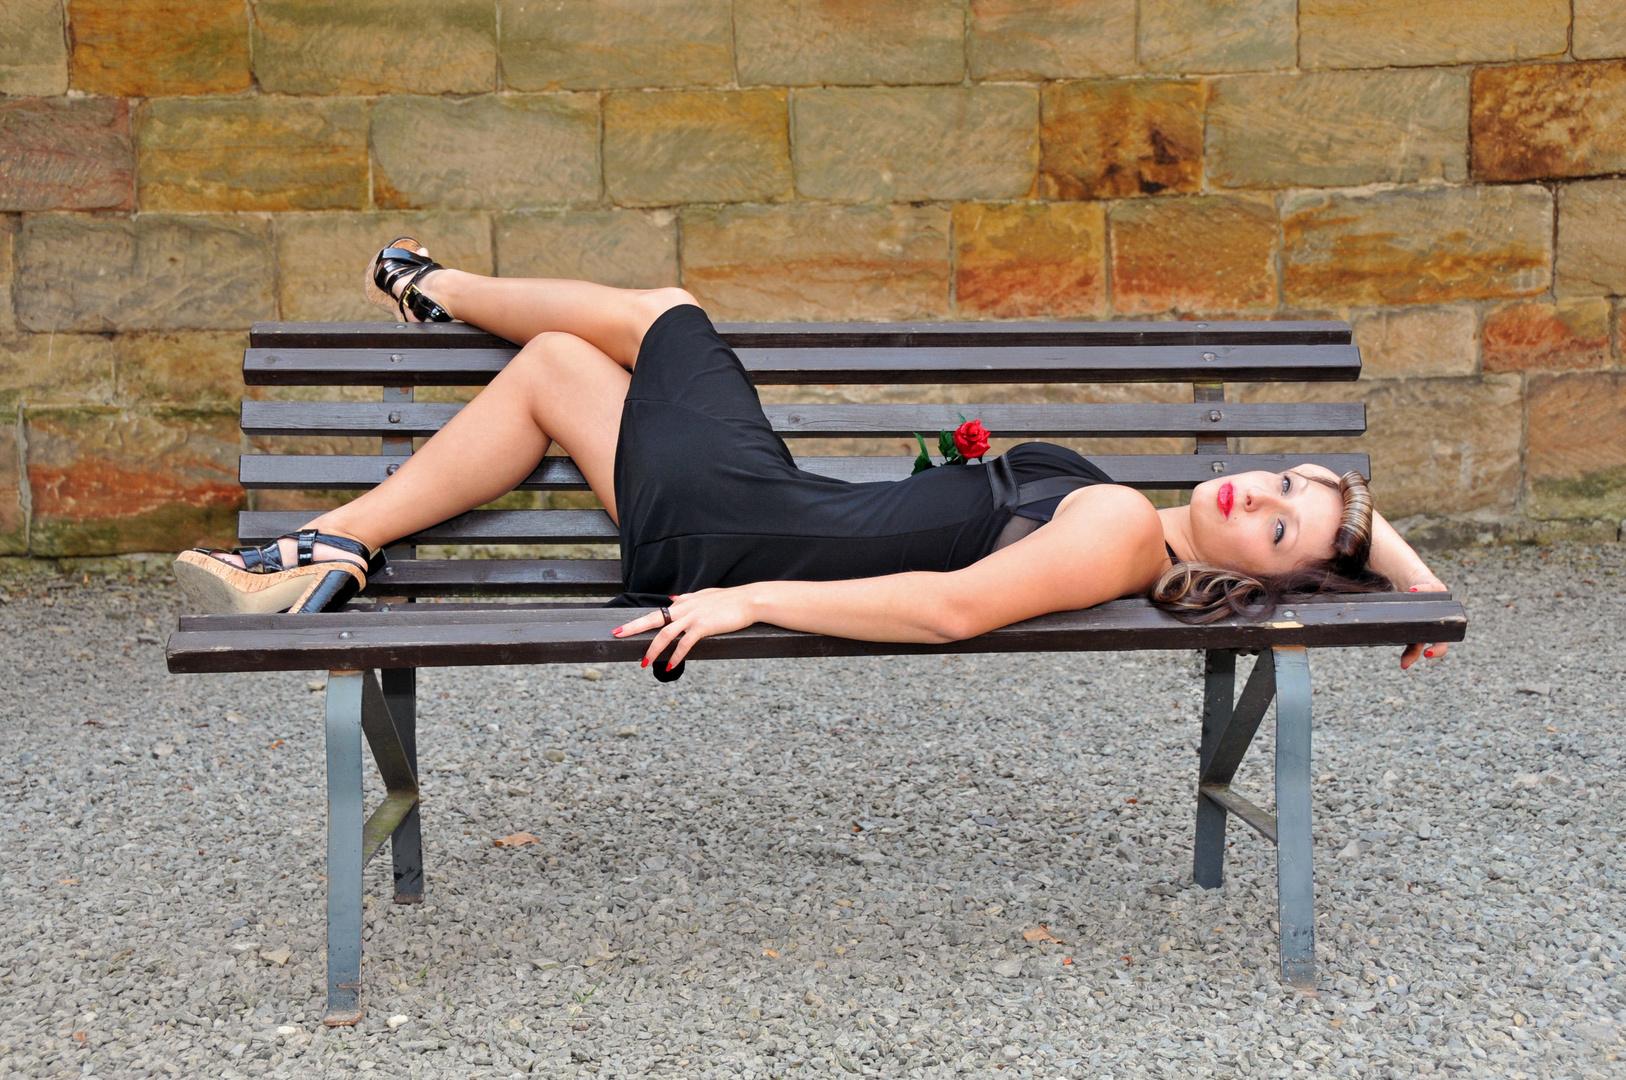 :black dress: